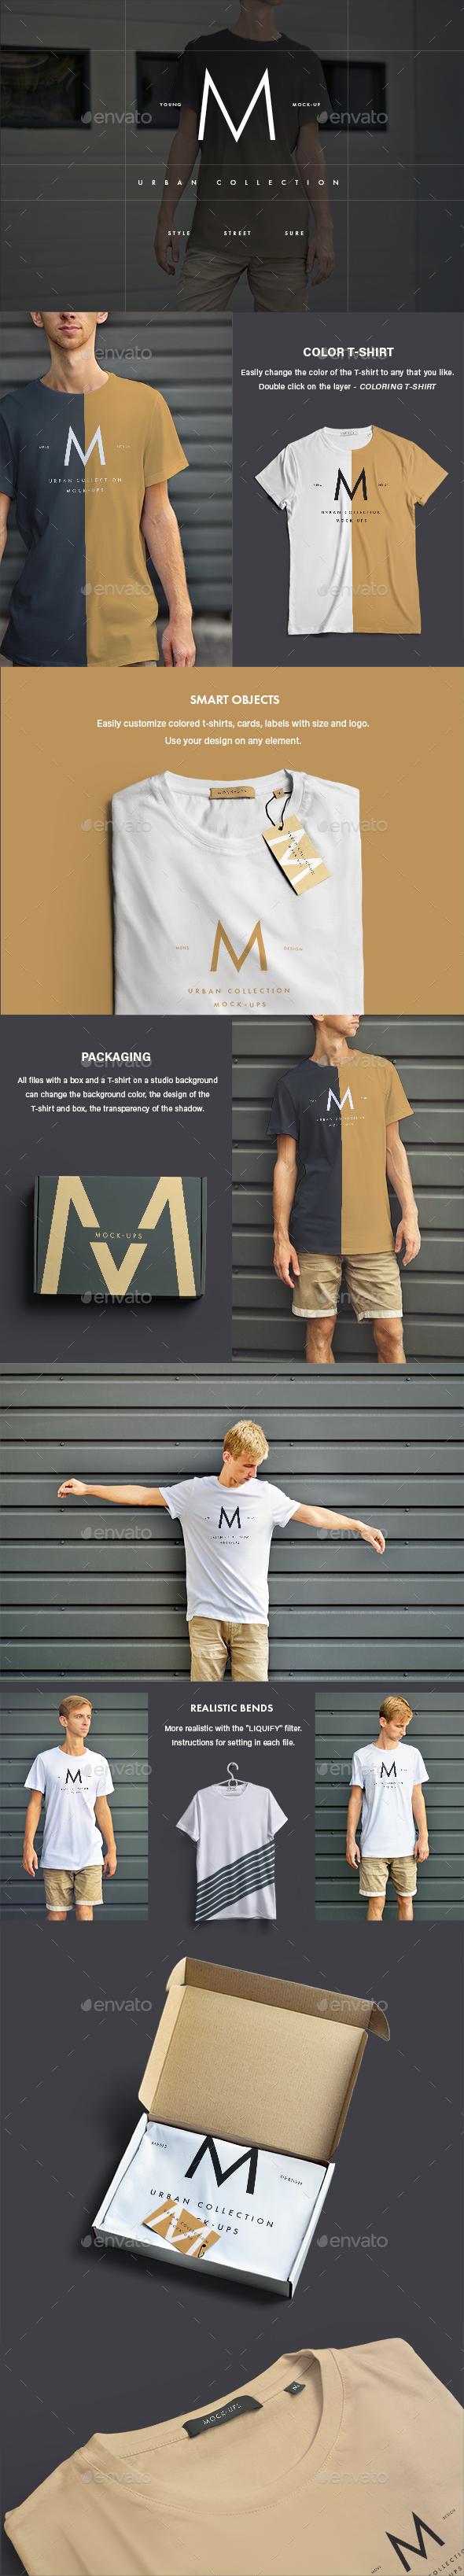 12 Mock-Ups Men's T-Shirt (6 Urban and 6 Studio Isolated) - T-shirts Apparel